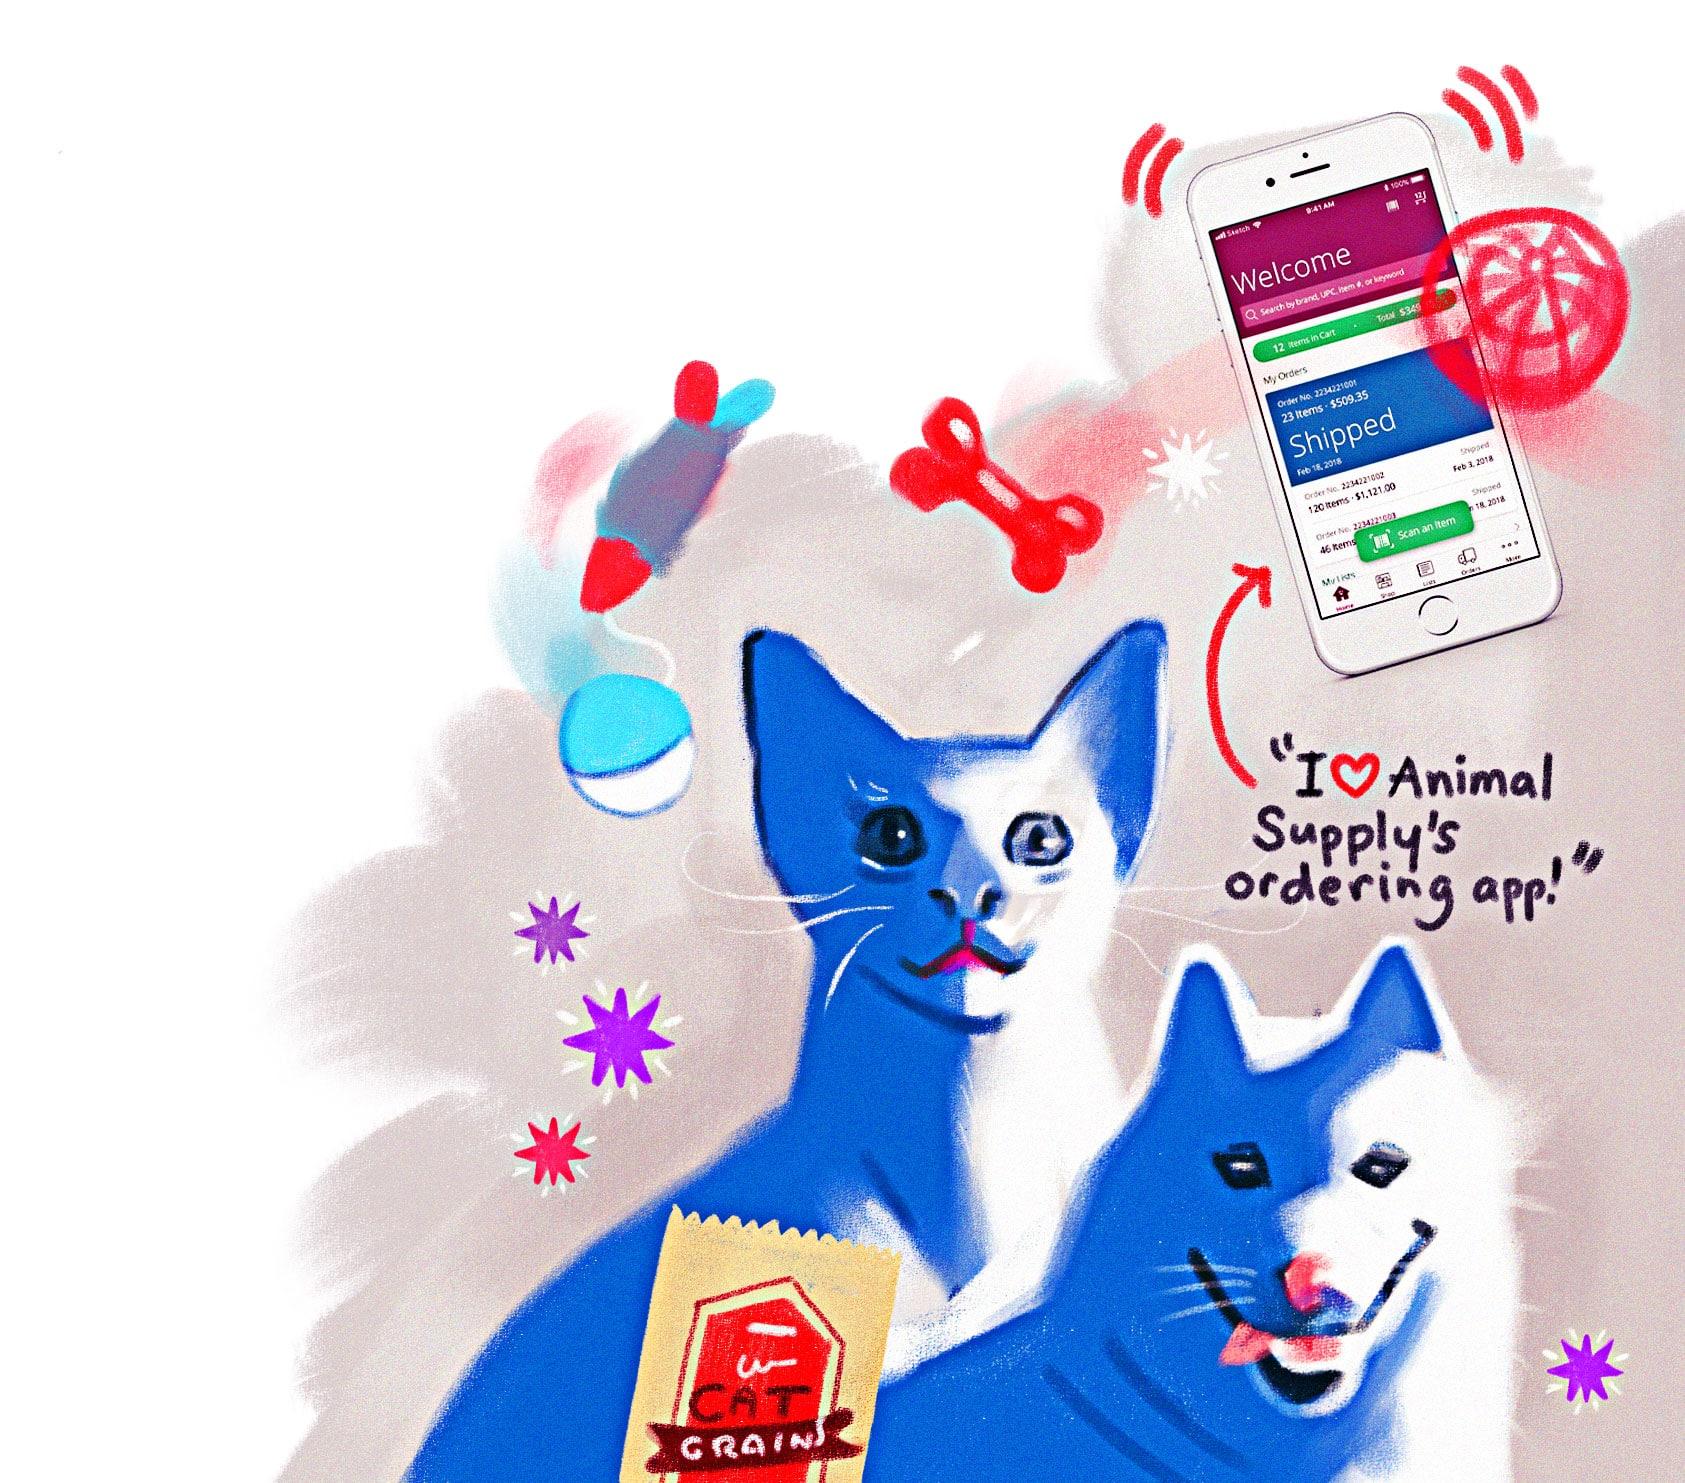 Animal Supply's ordering app